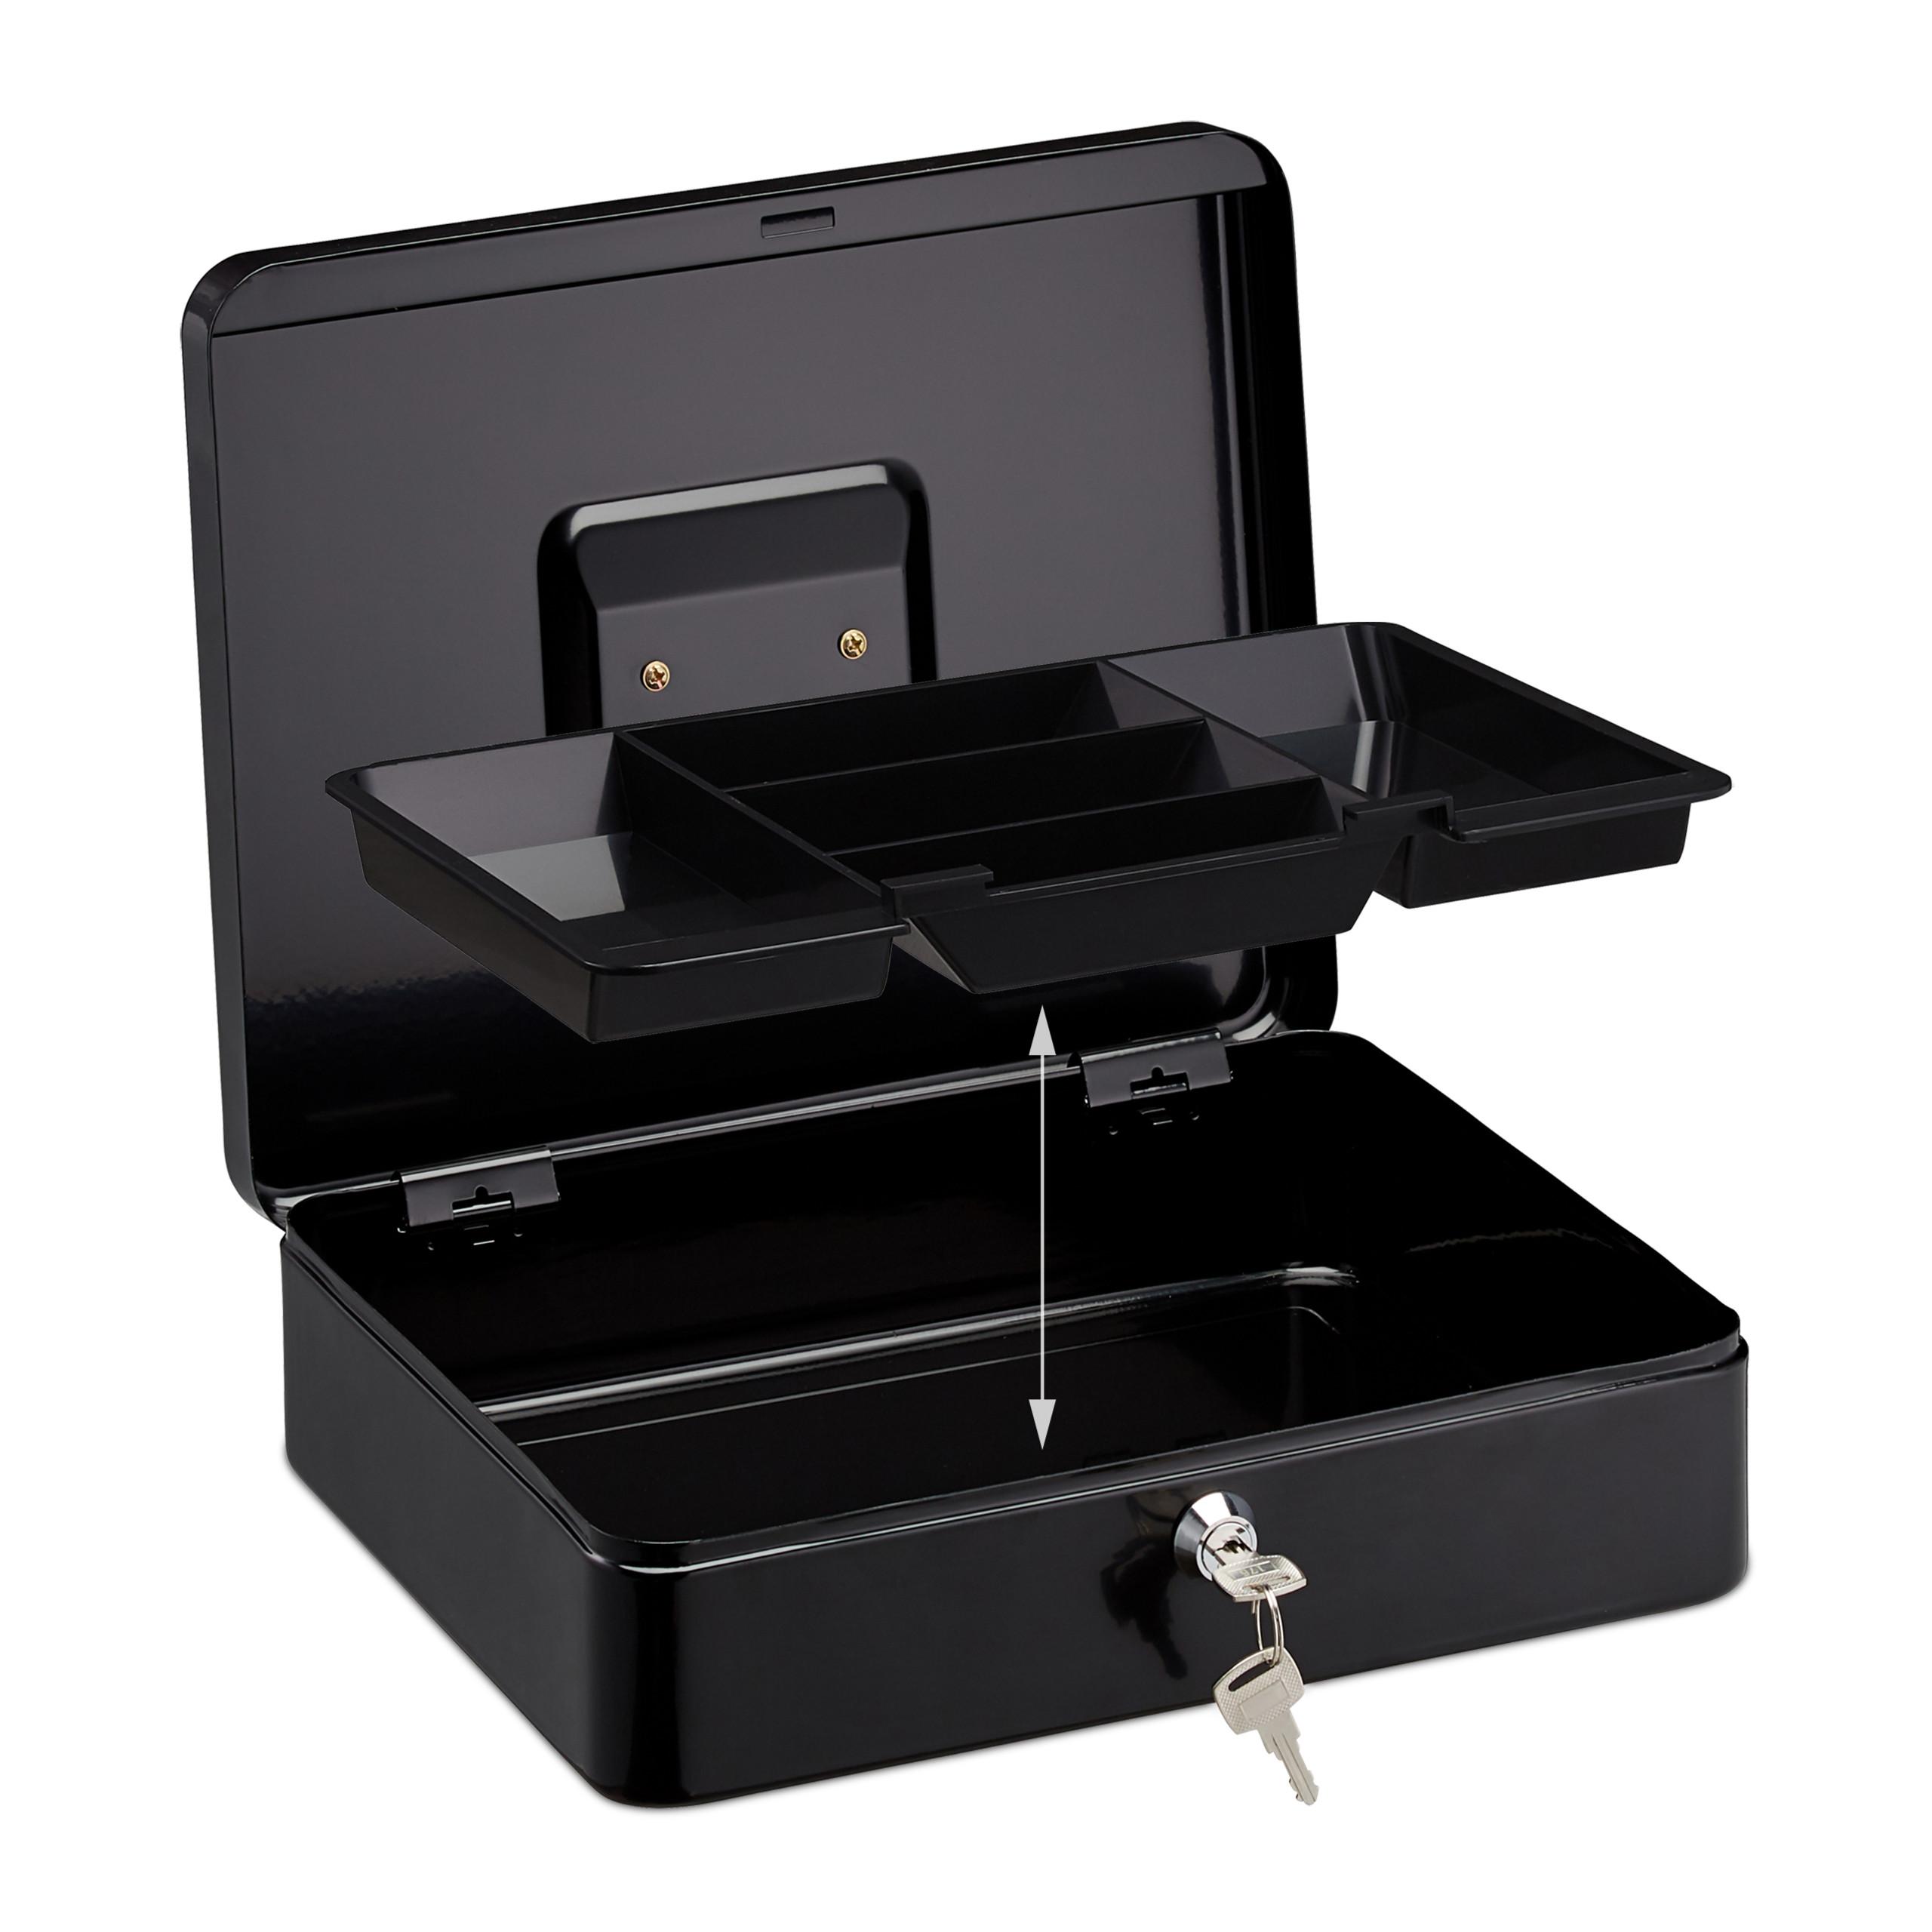 Lockable-Cash-Box-Large-Locking-Money-Box-with-2-Keys-Metal-Case-Safe thumbnail 7